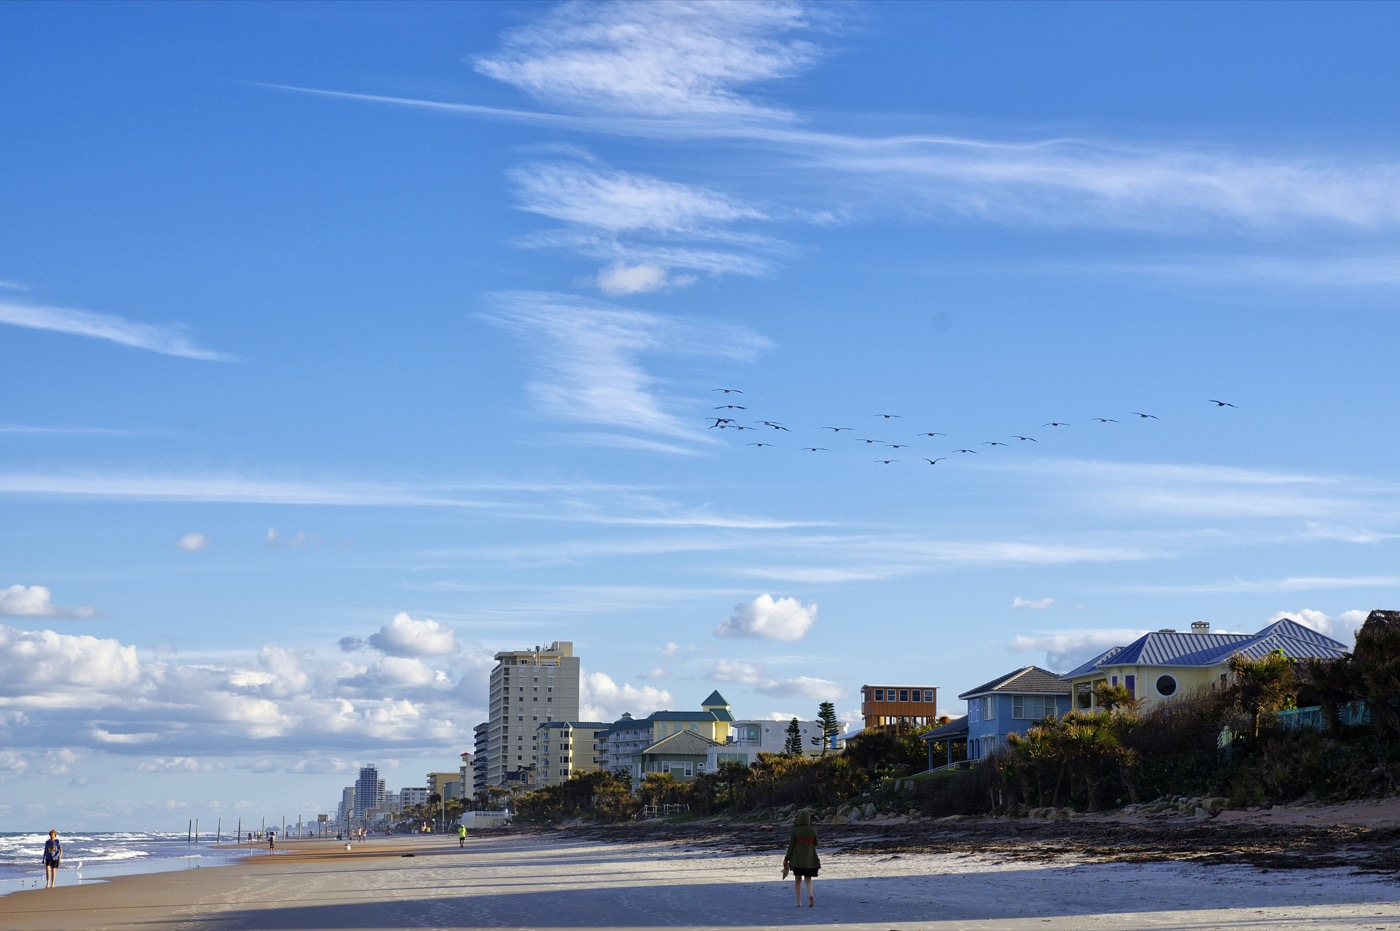 The Blue sky over Daytona Beach, Florida, USA